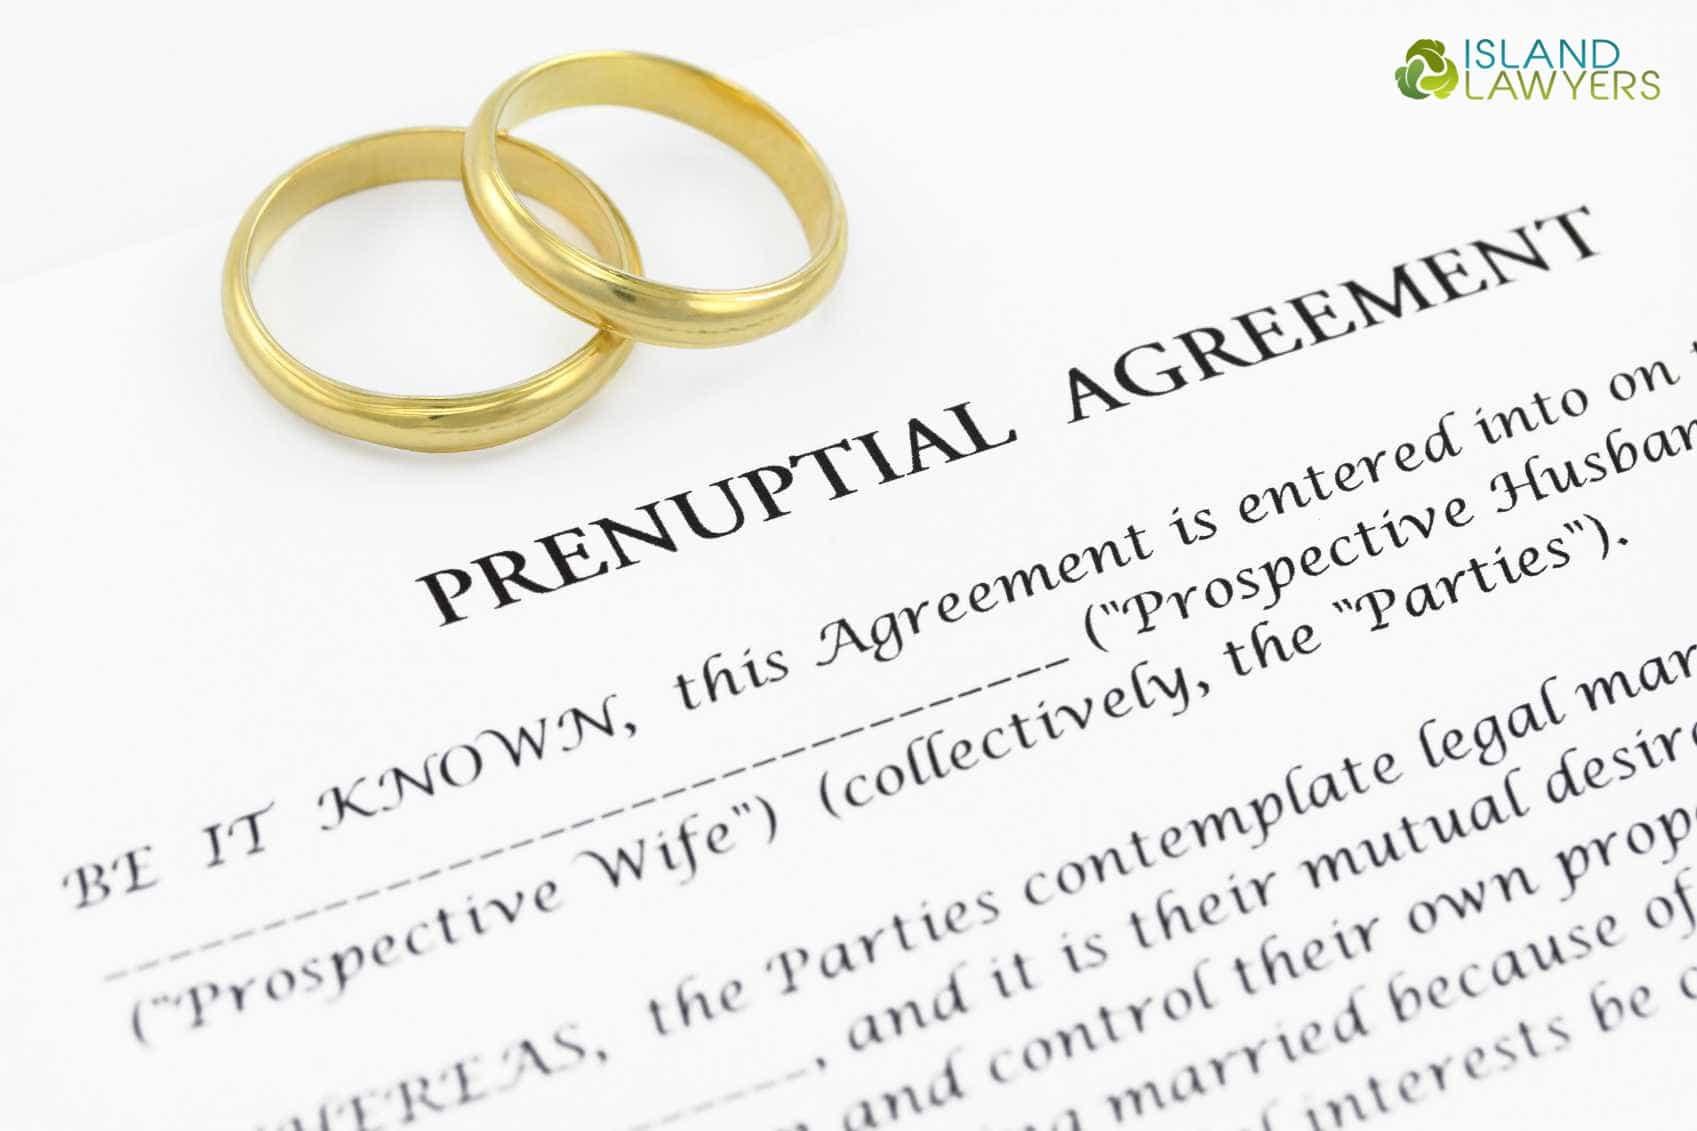 Alimony Options In Prenuptial Agreements Doiluke Island Lawyers